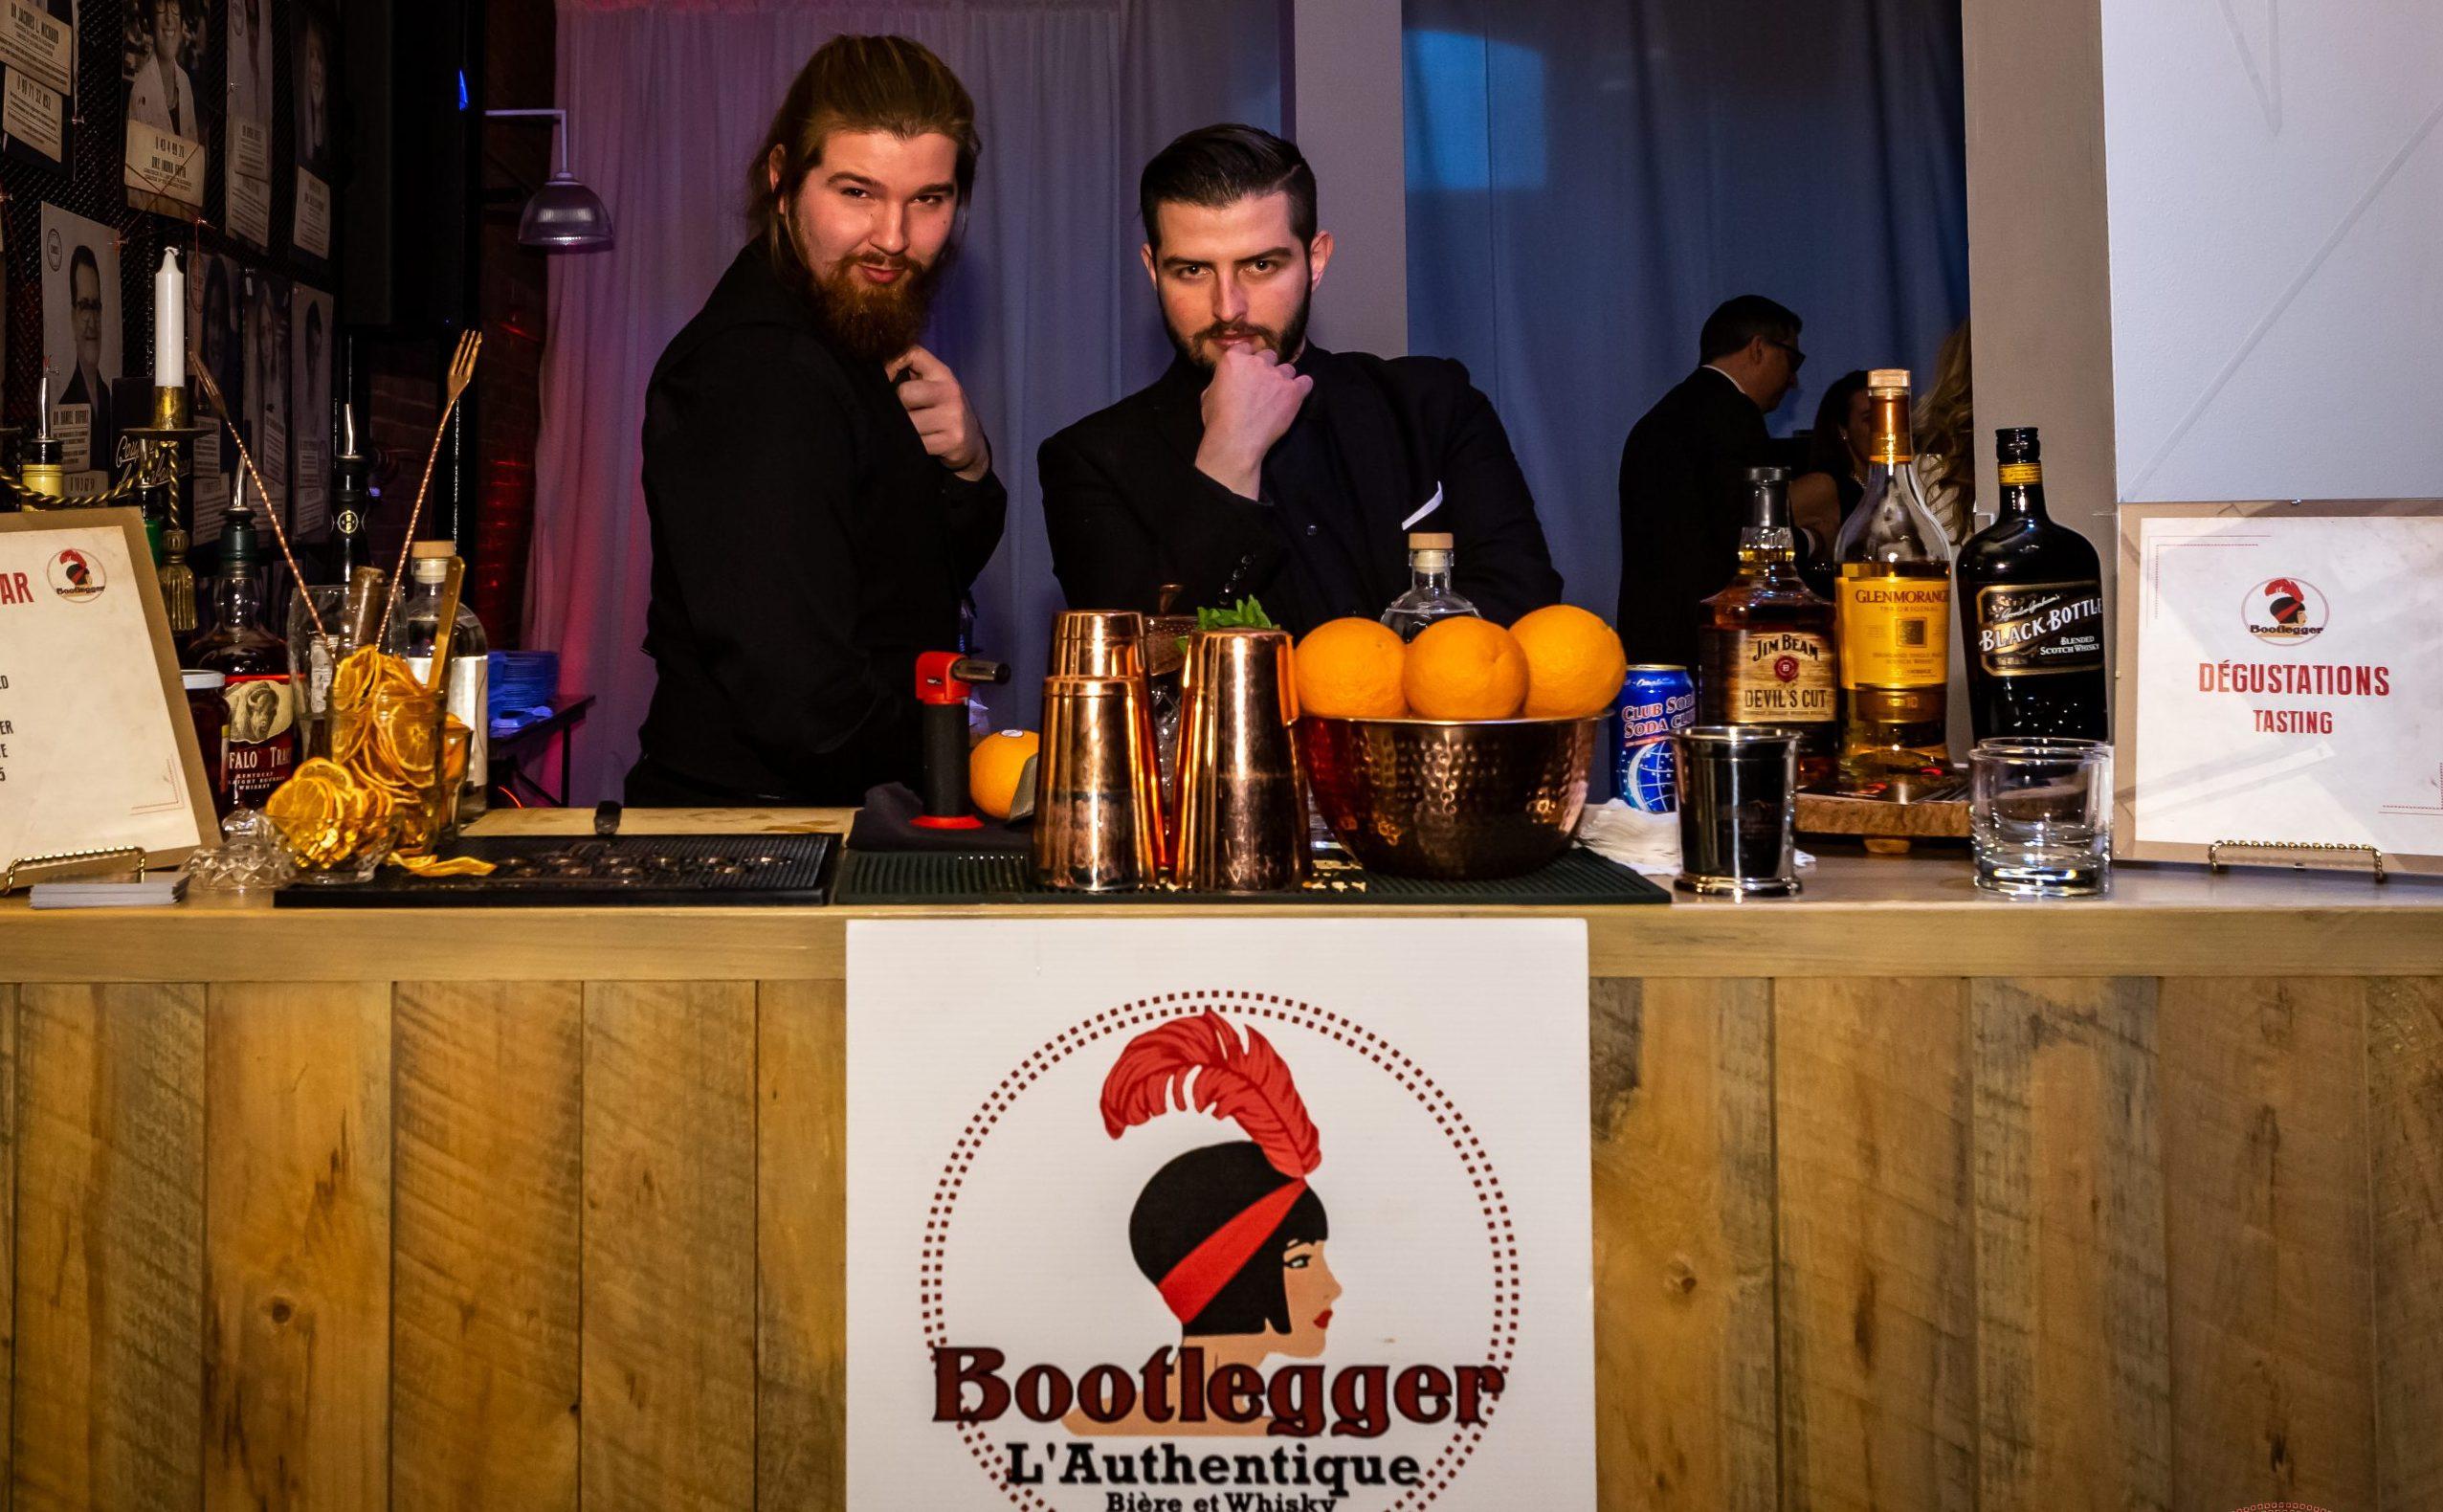 bootlegger l'authentique bartender dégustation whisky